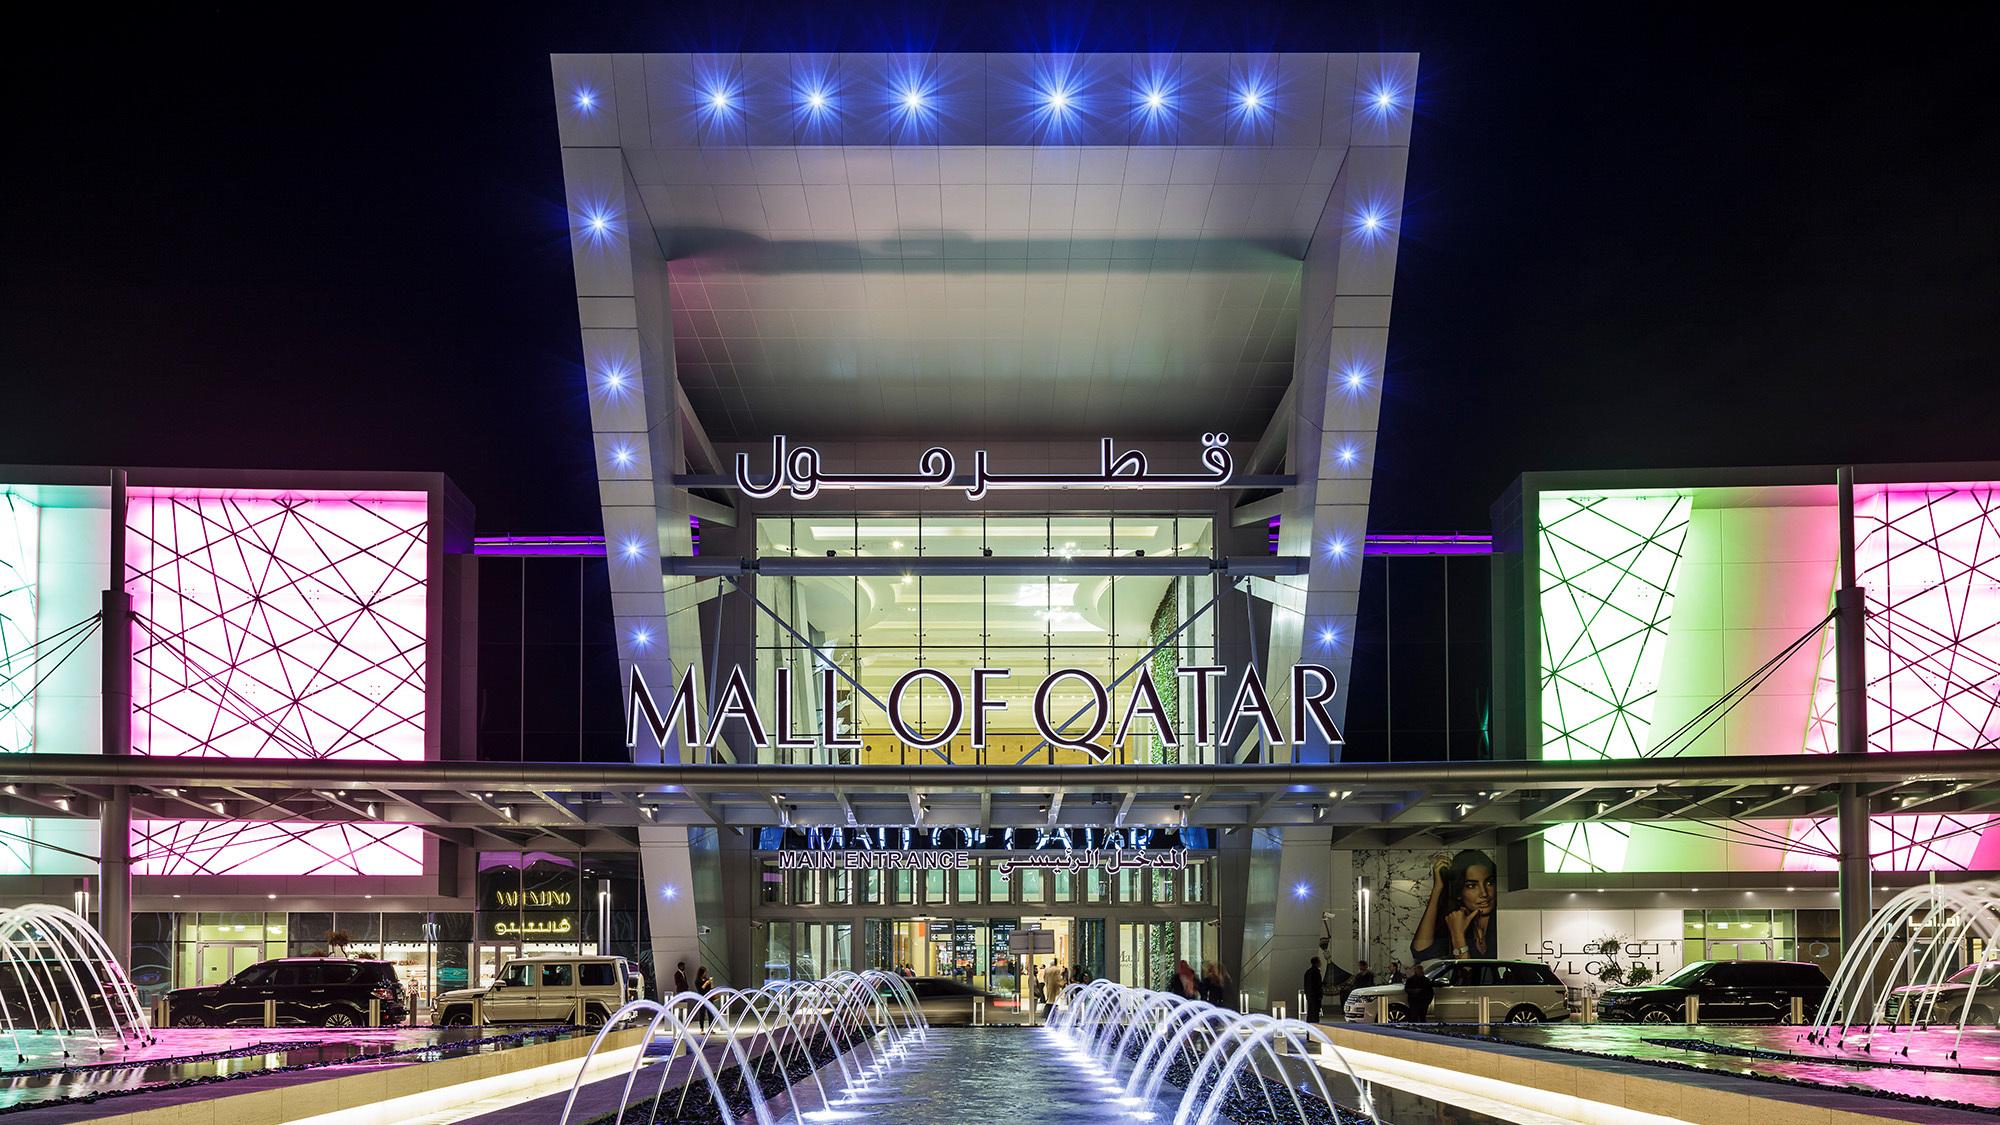 Chapman Taylor Mall Of Qatar